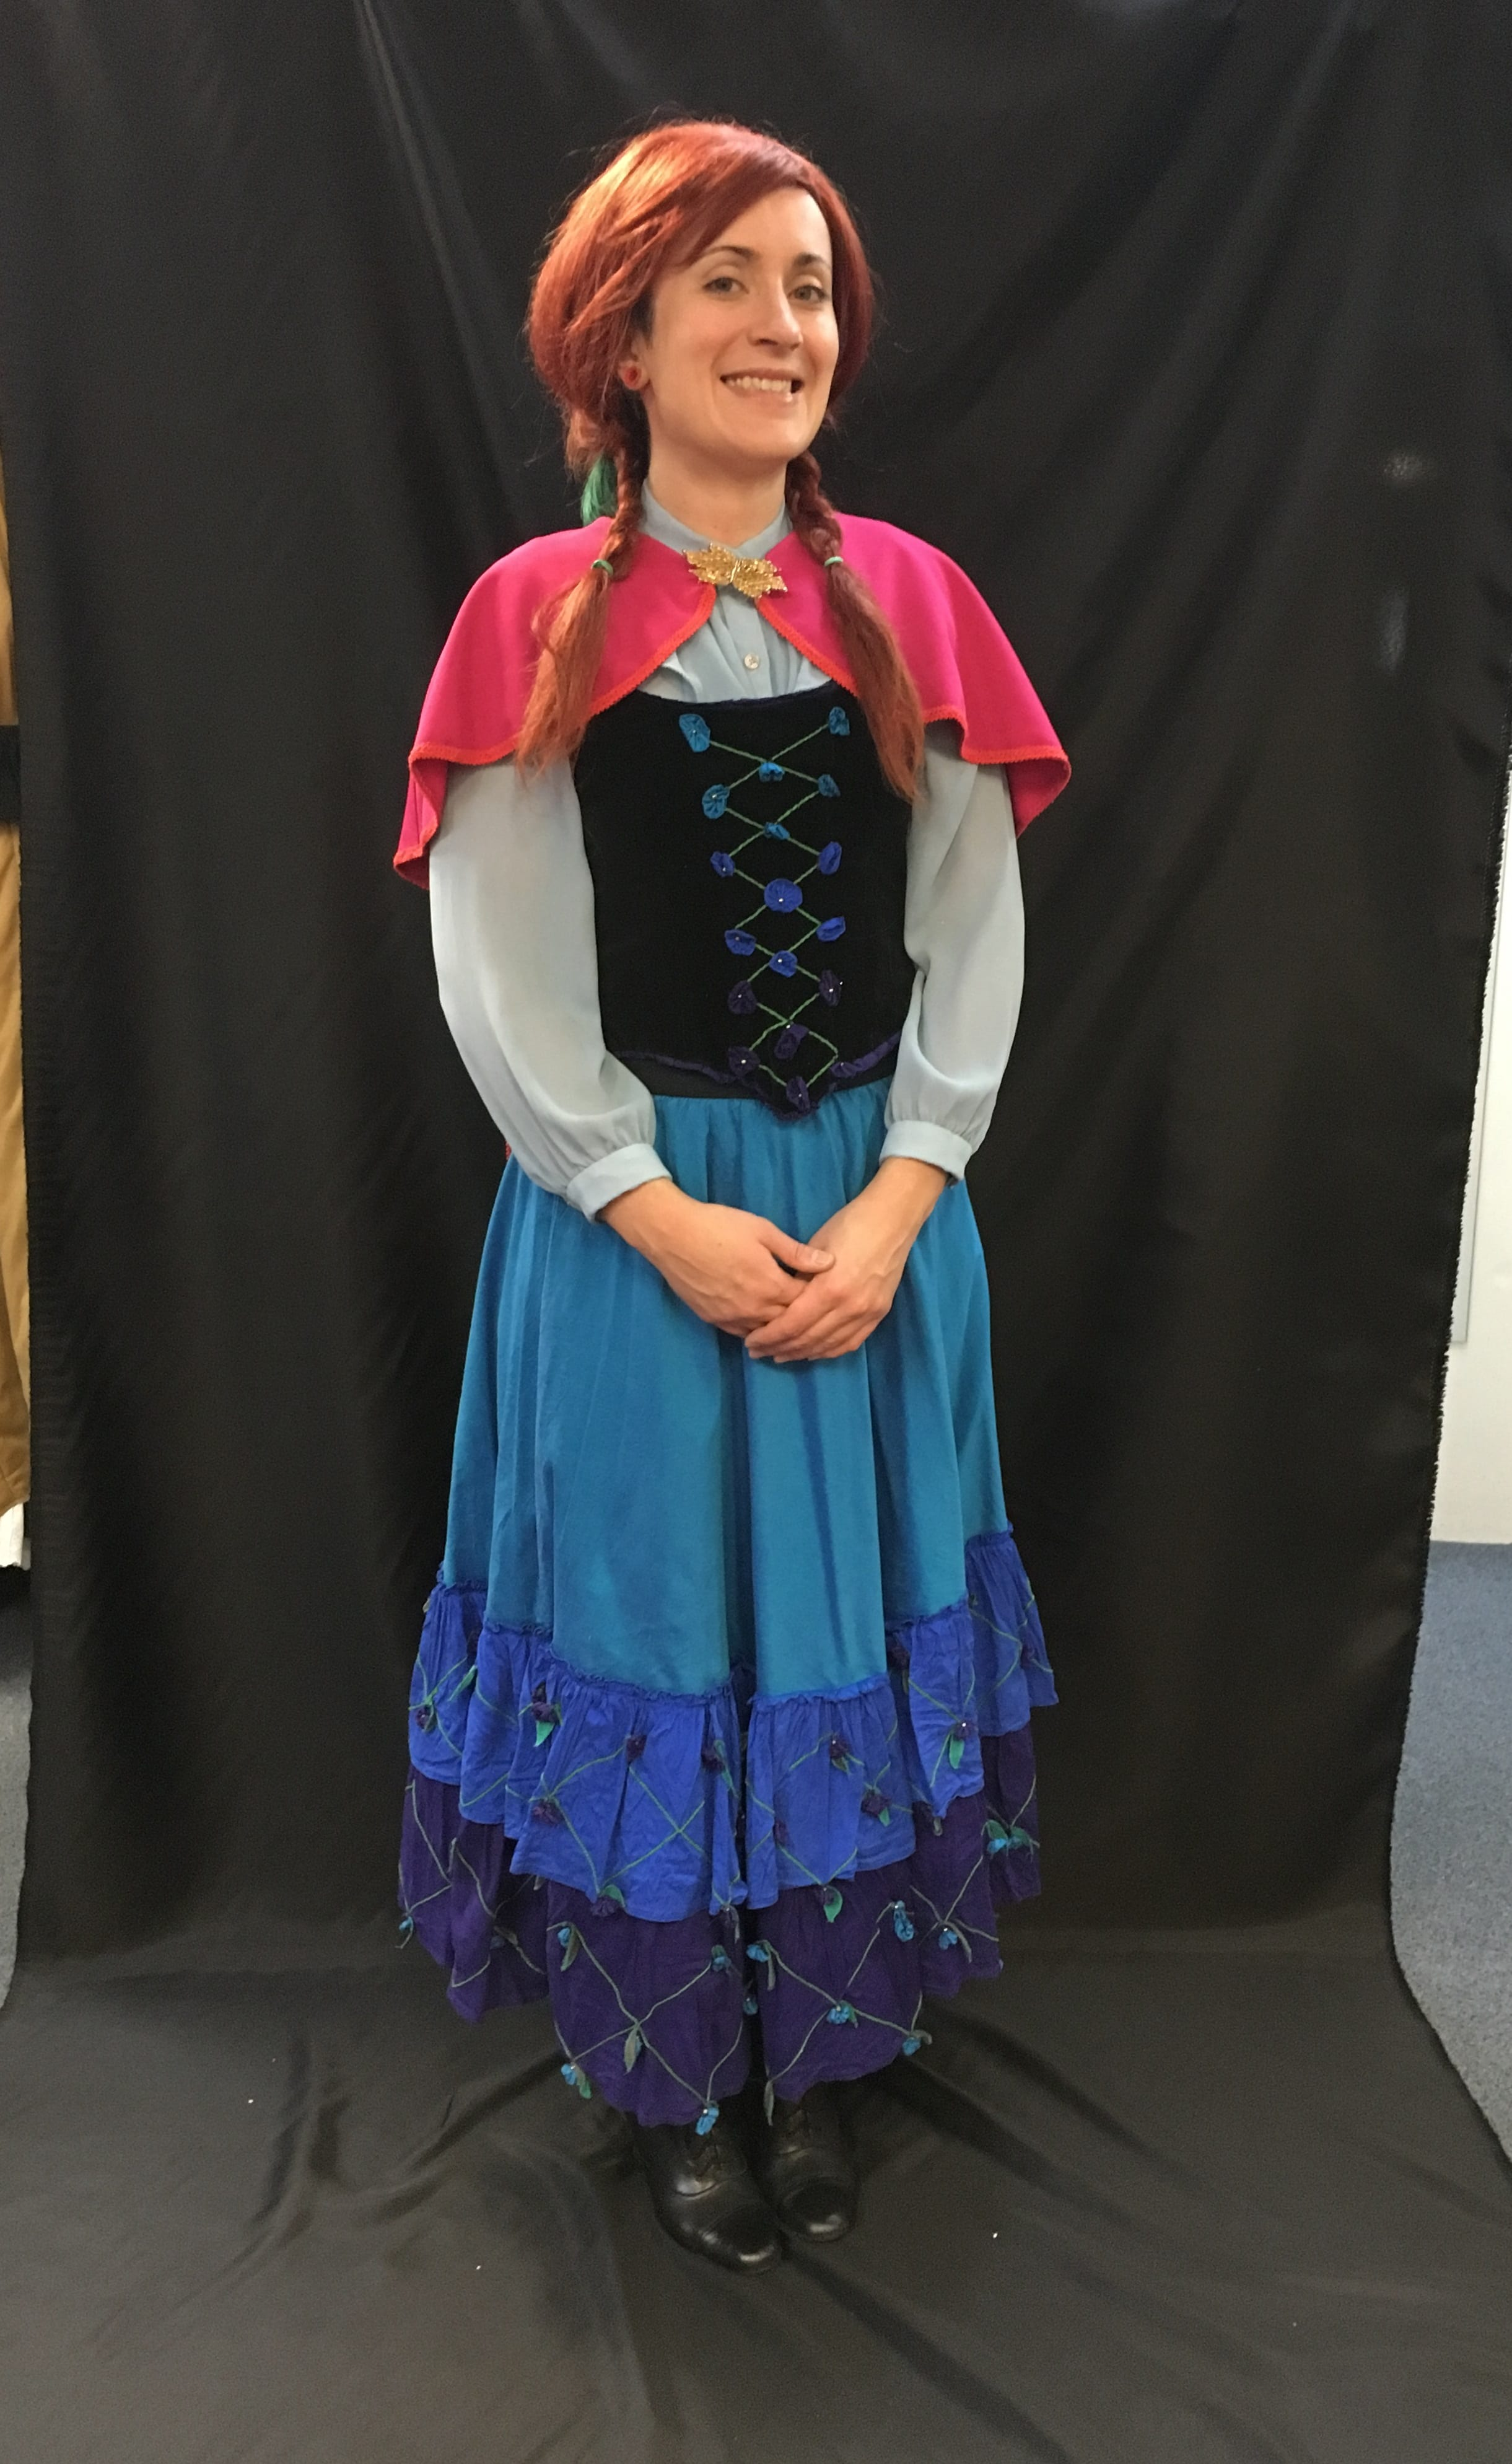 Princess Costume Hire in Melbourne  sc 1 st  Heidelberg Fancy Dress & Princess Costume Hire Melbourne | Heidelberg Fancy Dress